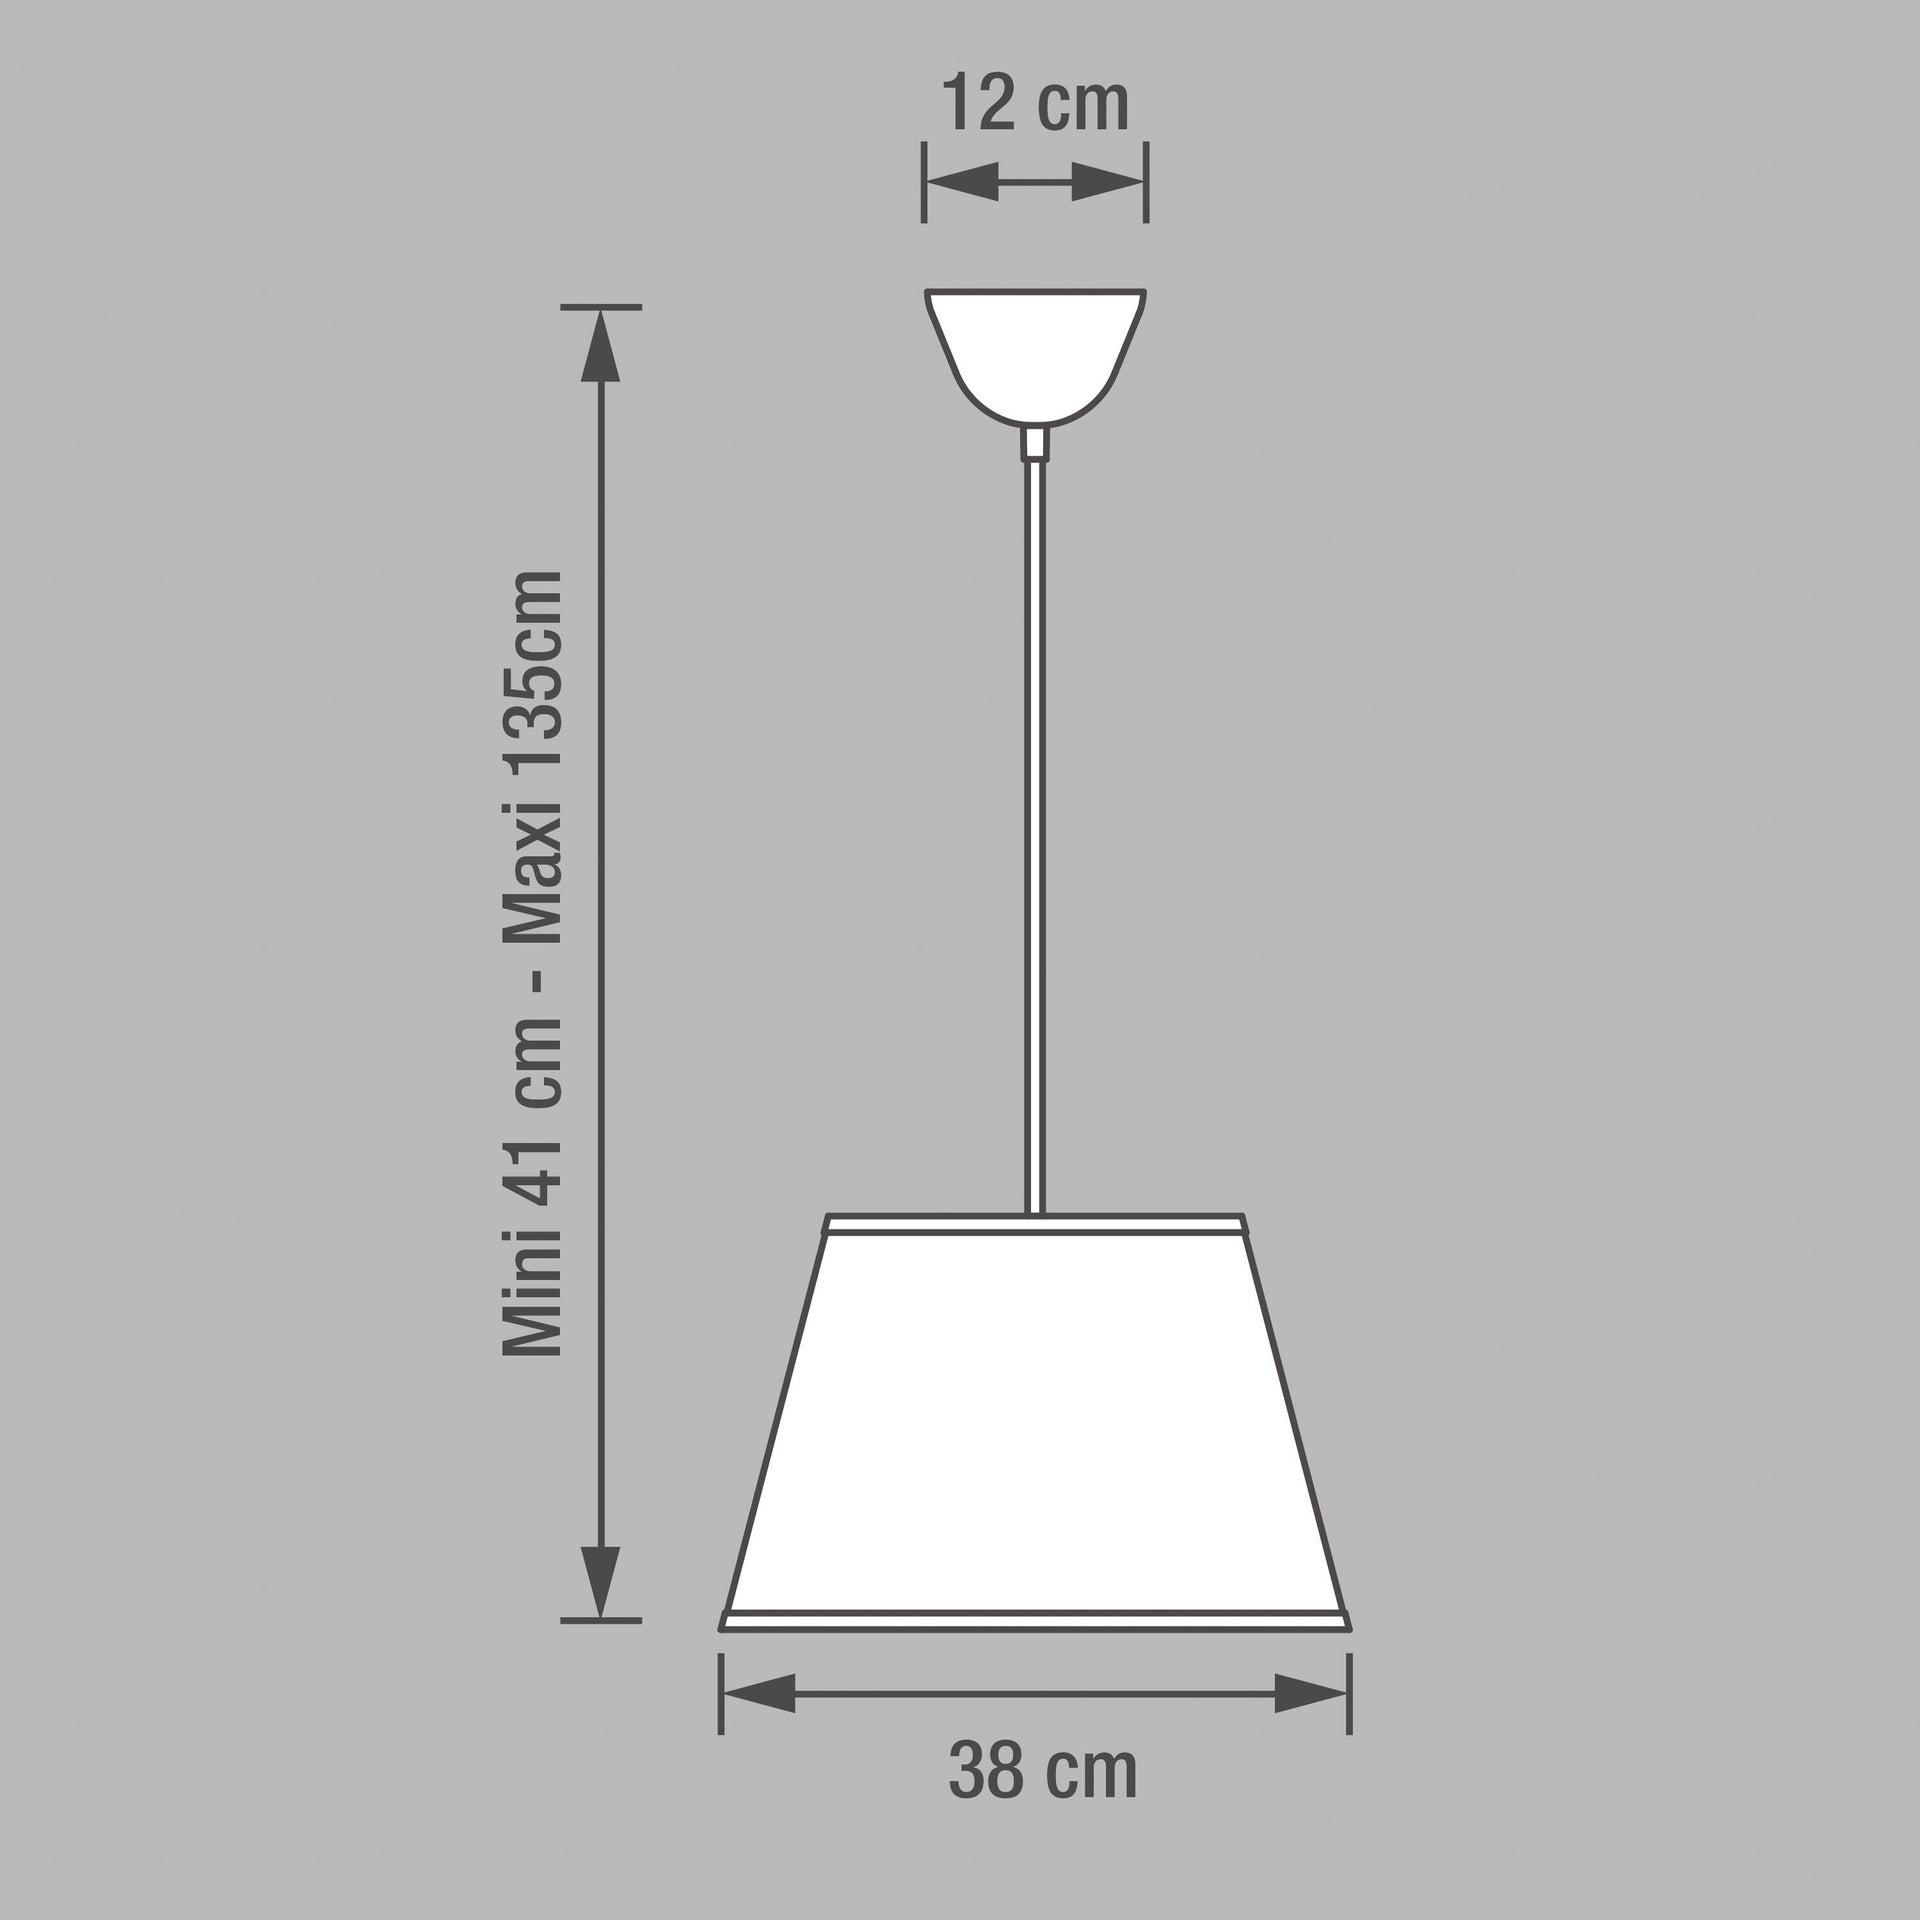 Lampadario Moderno Sitia bianco in tessuto, D. 38 cm, L. 25 cm, INSPIRE - 5